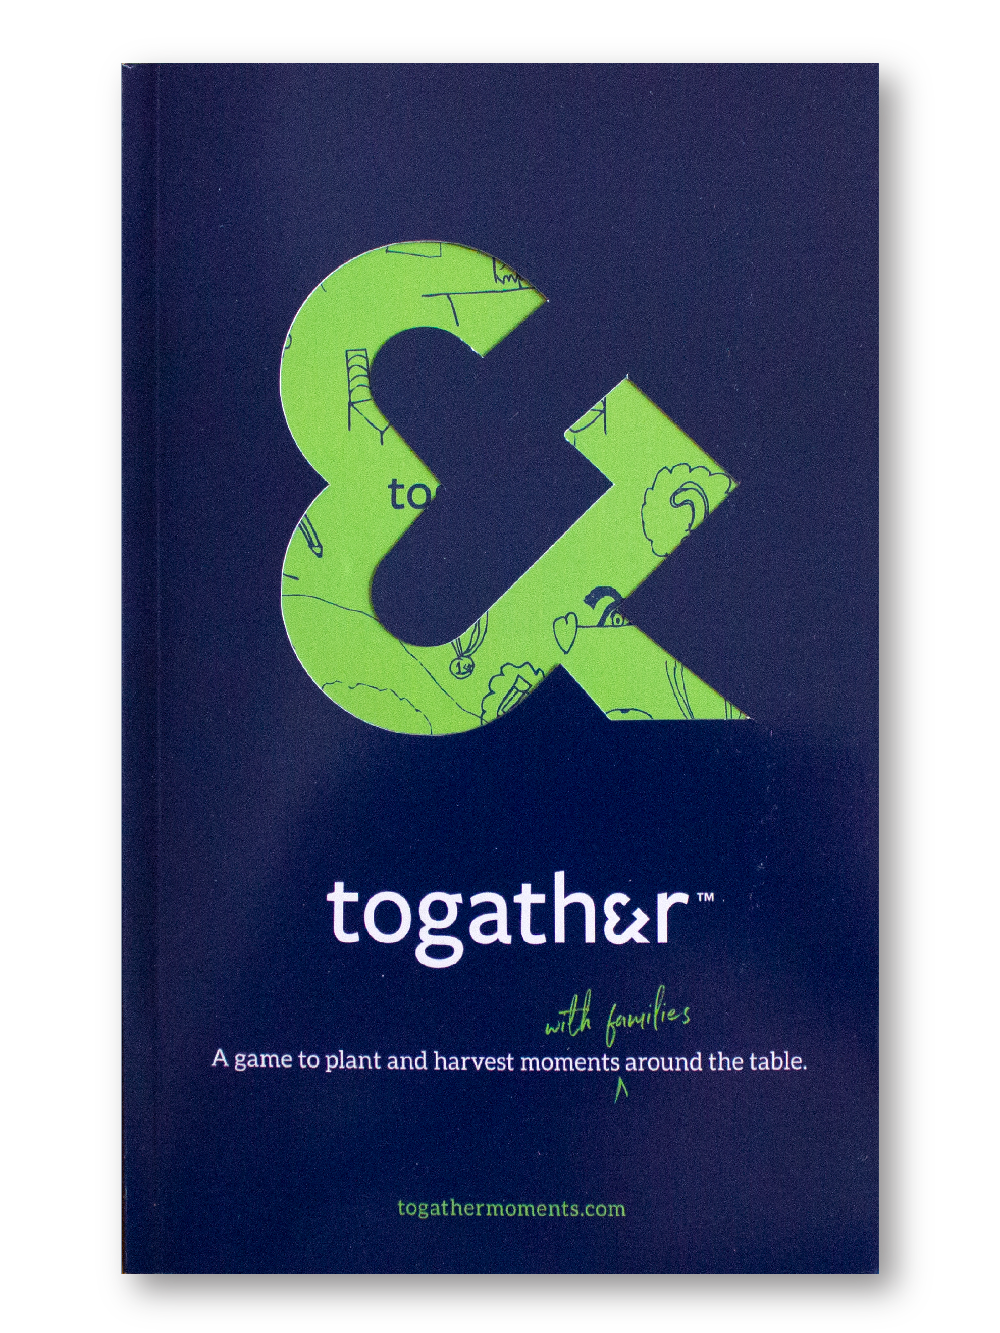 Togather_Web_Graphics_Togather_Mockup.png